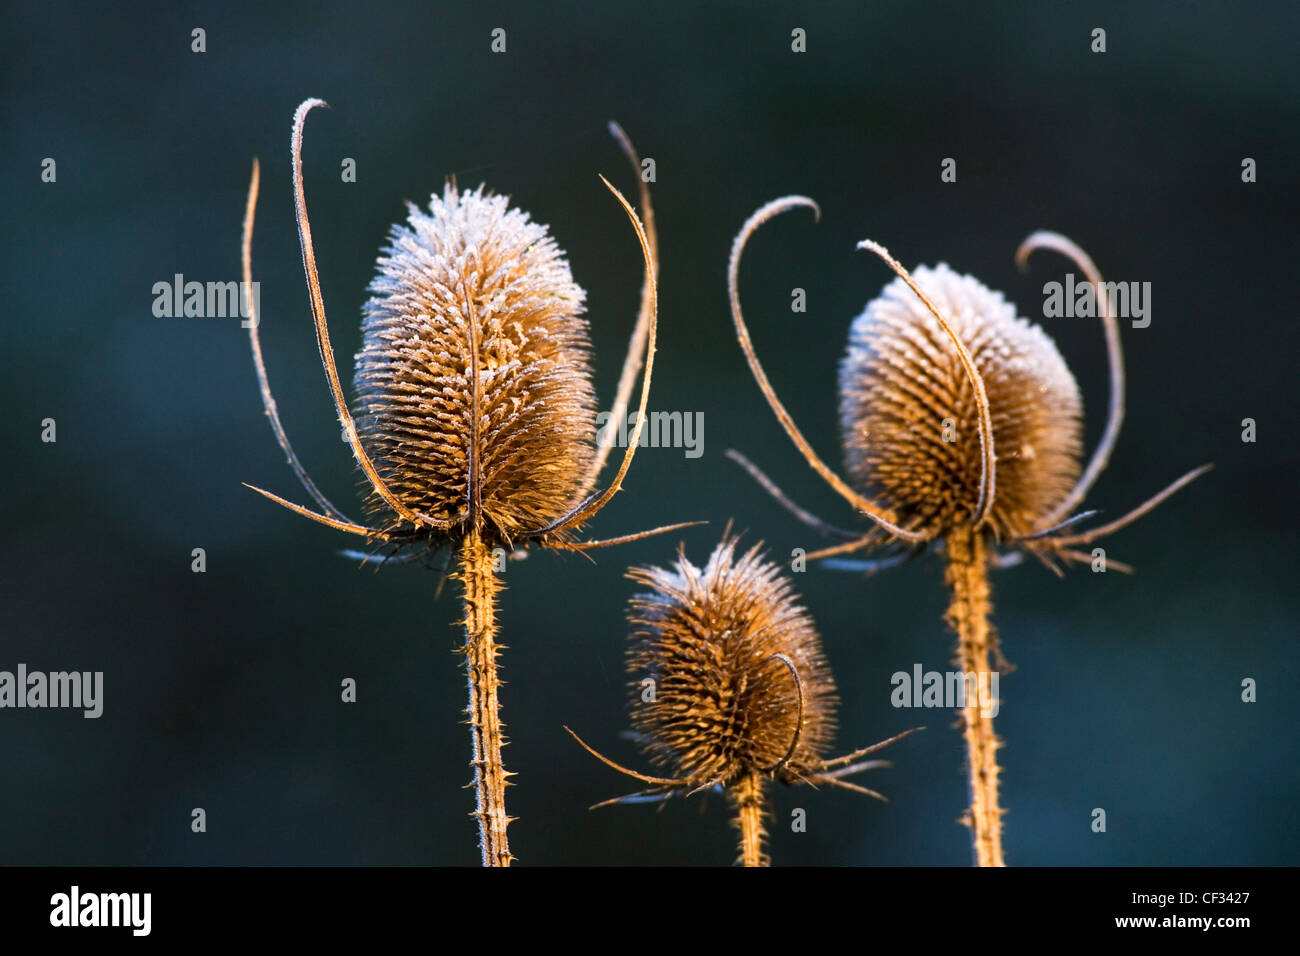 A close-up of Teasel (Dipsacus fullonum), a popular biennial wildflower. - Stock Image